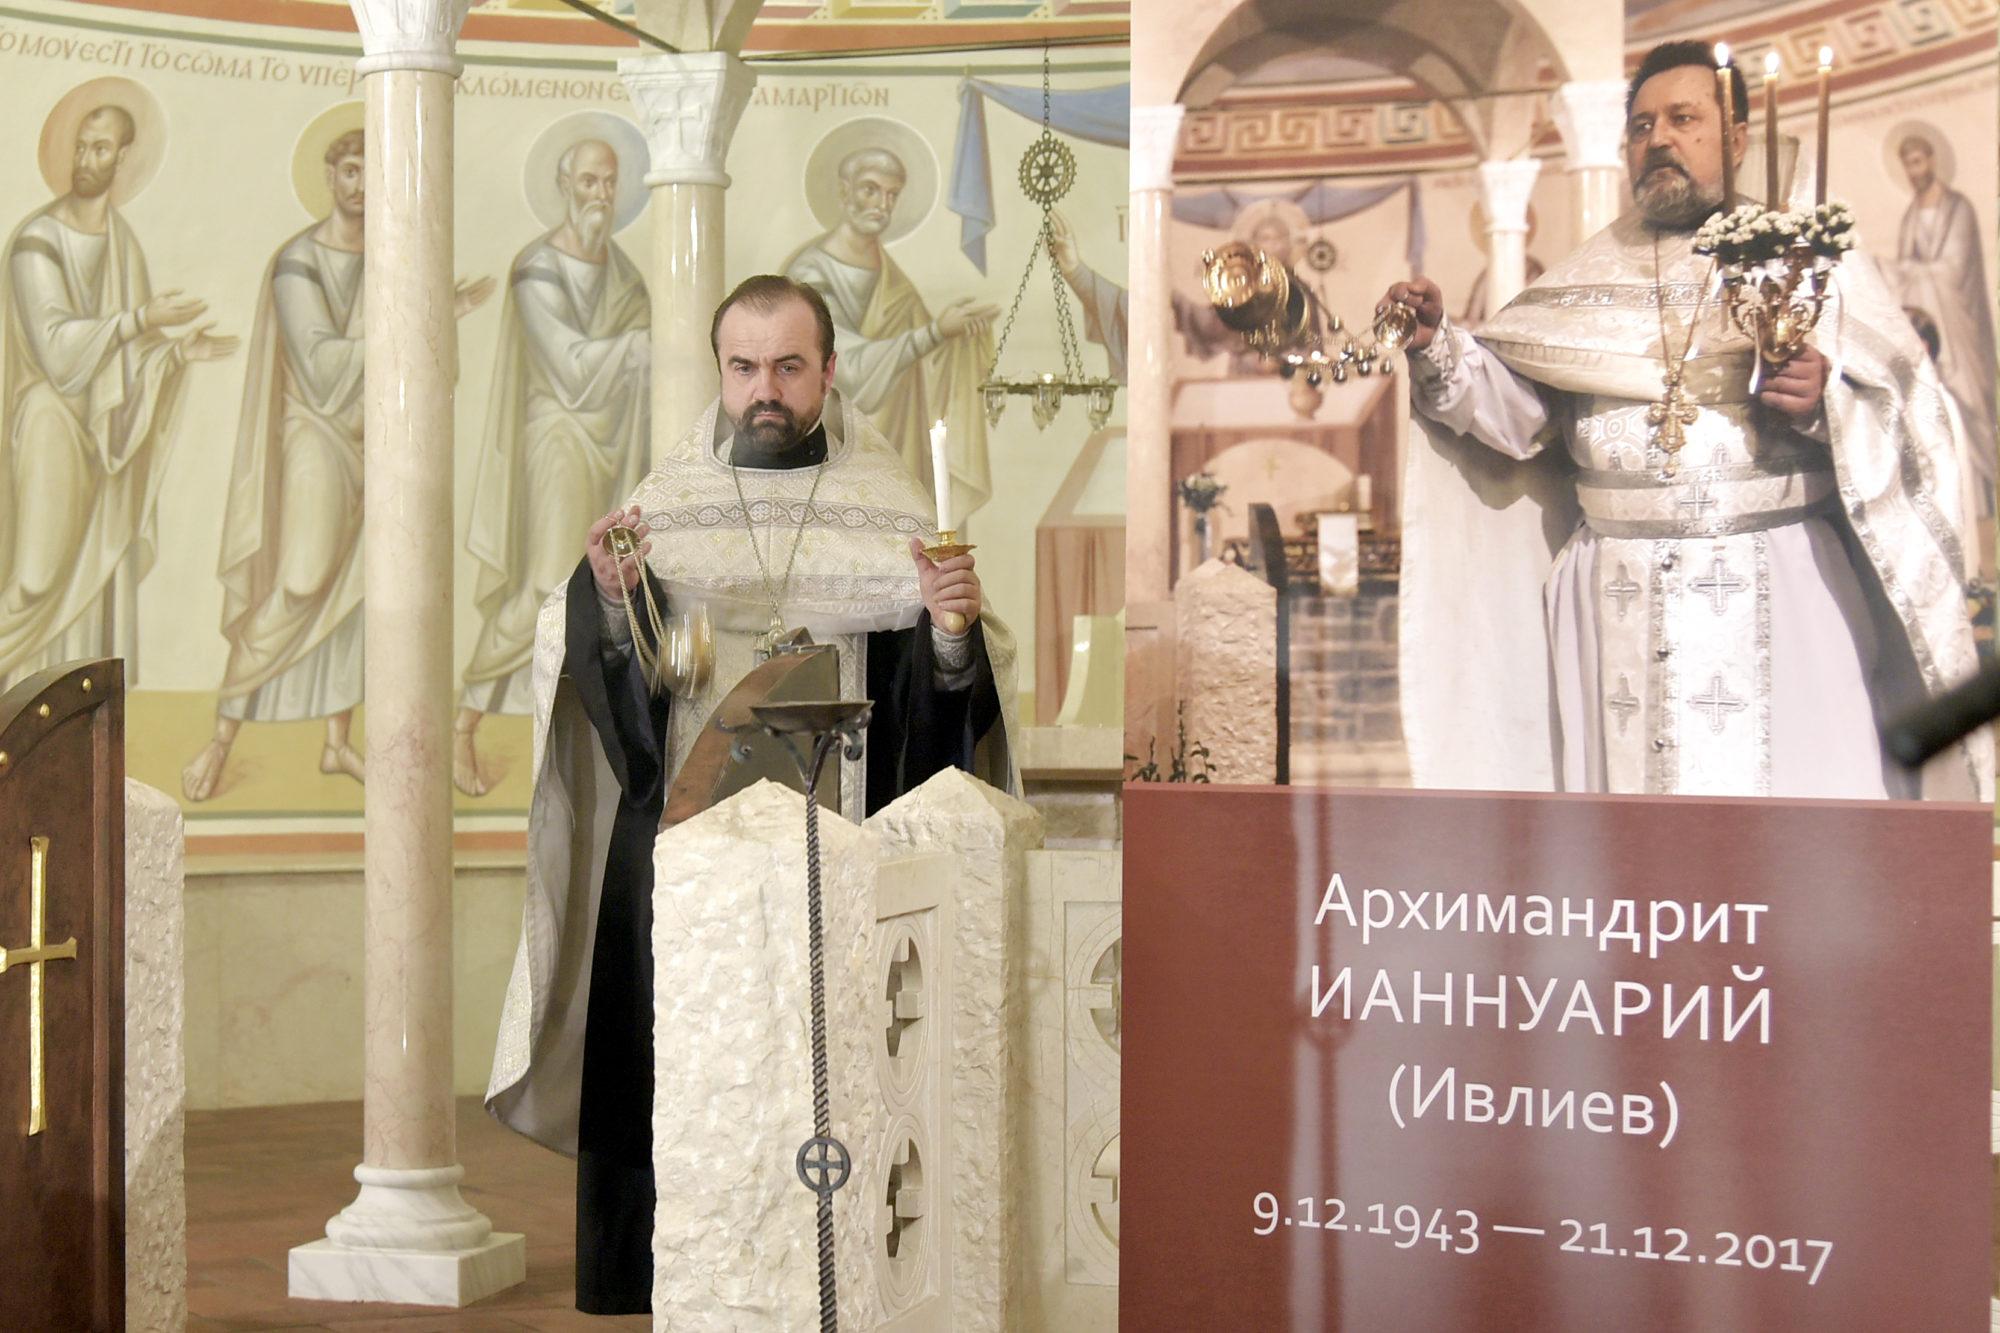 Состоялся вечер памяти архимандрита Ианнуария (Ивлиева)